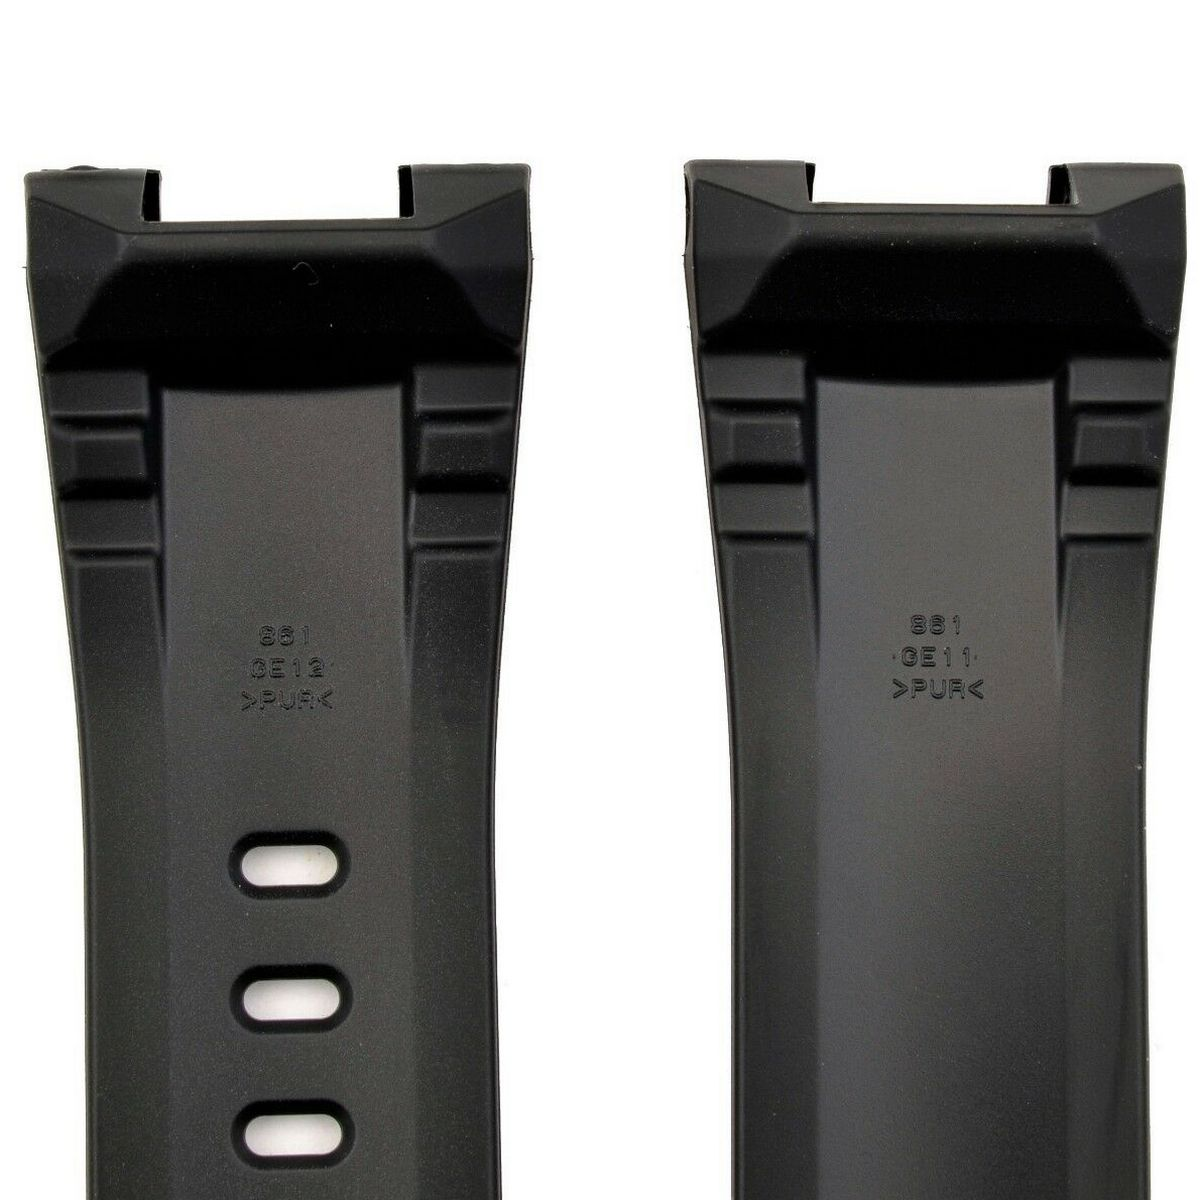 Pulseira Casio GST-400 GST-410 GST-210B GST-W100G GST-S100G  Resina  Preta  - E-Presentes